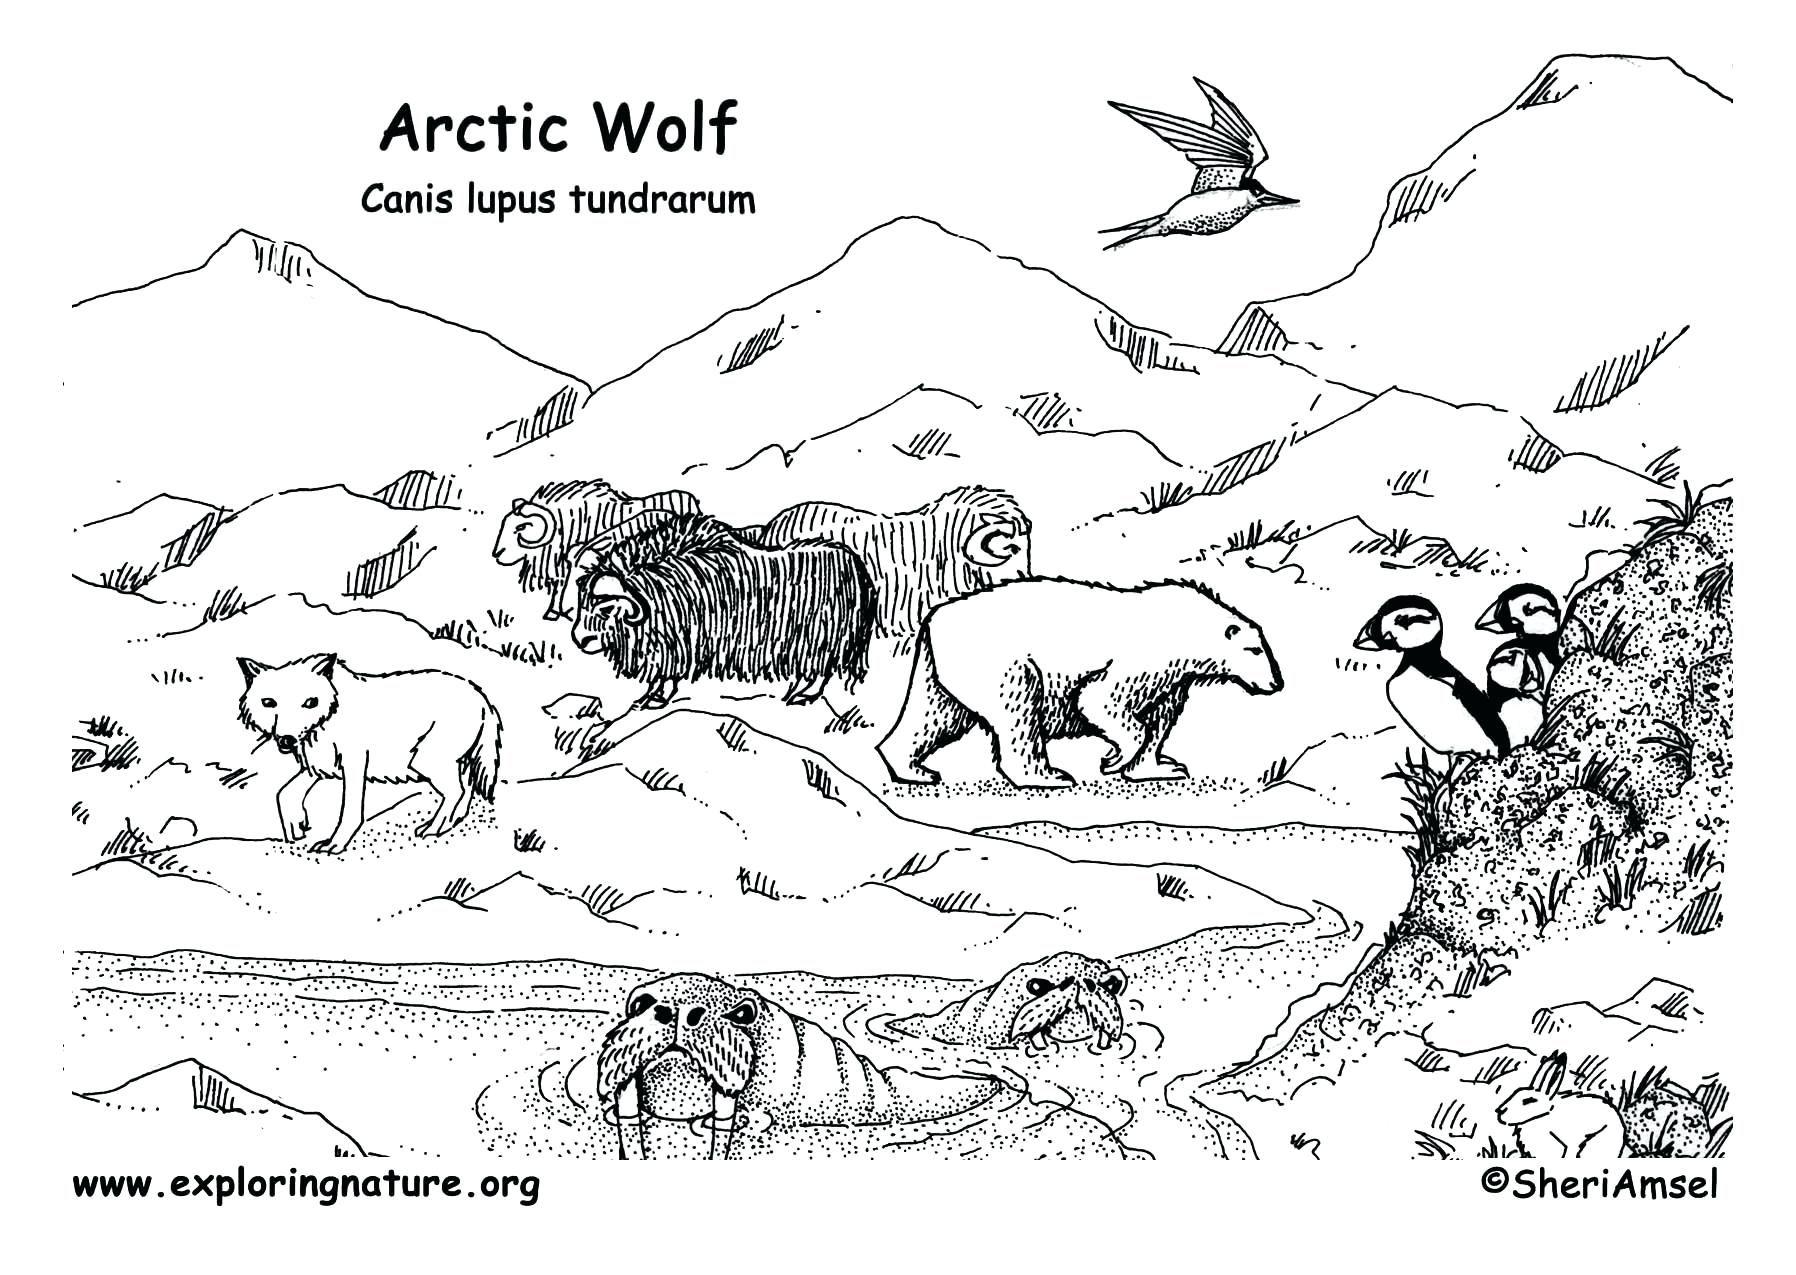 Arctic Habitat Coloring Pages Collection Arctic habitat